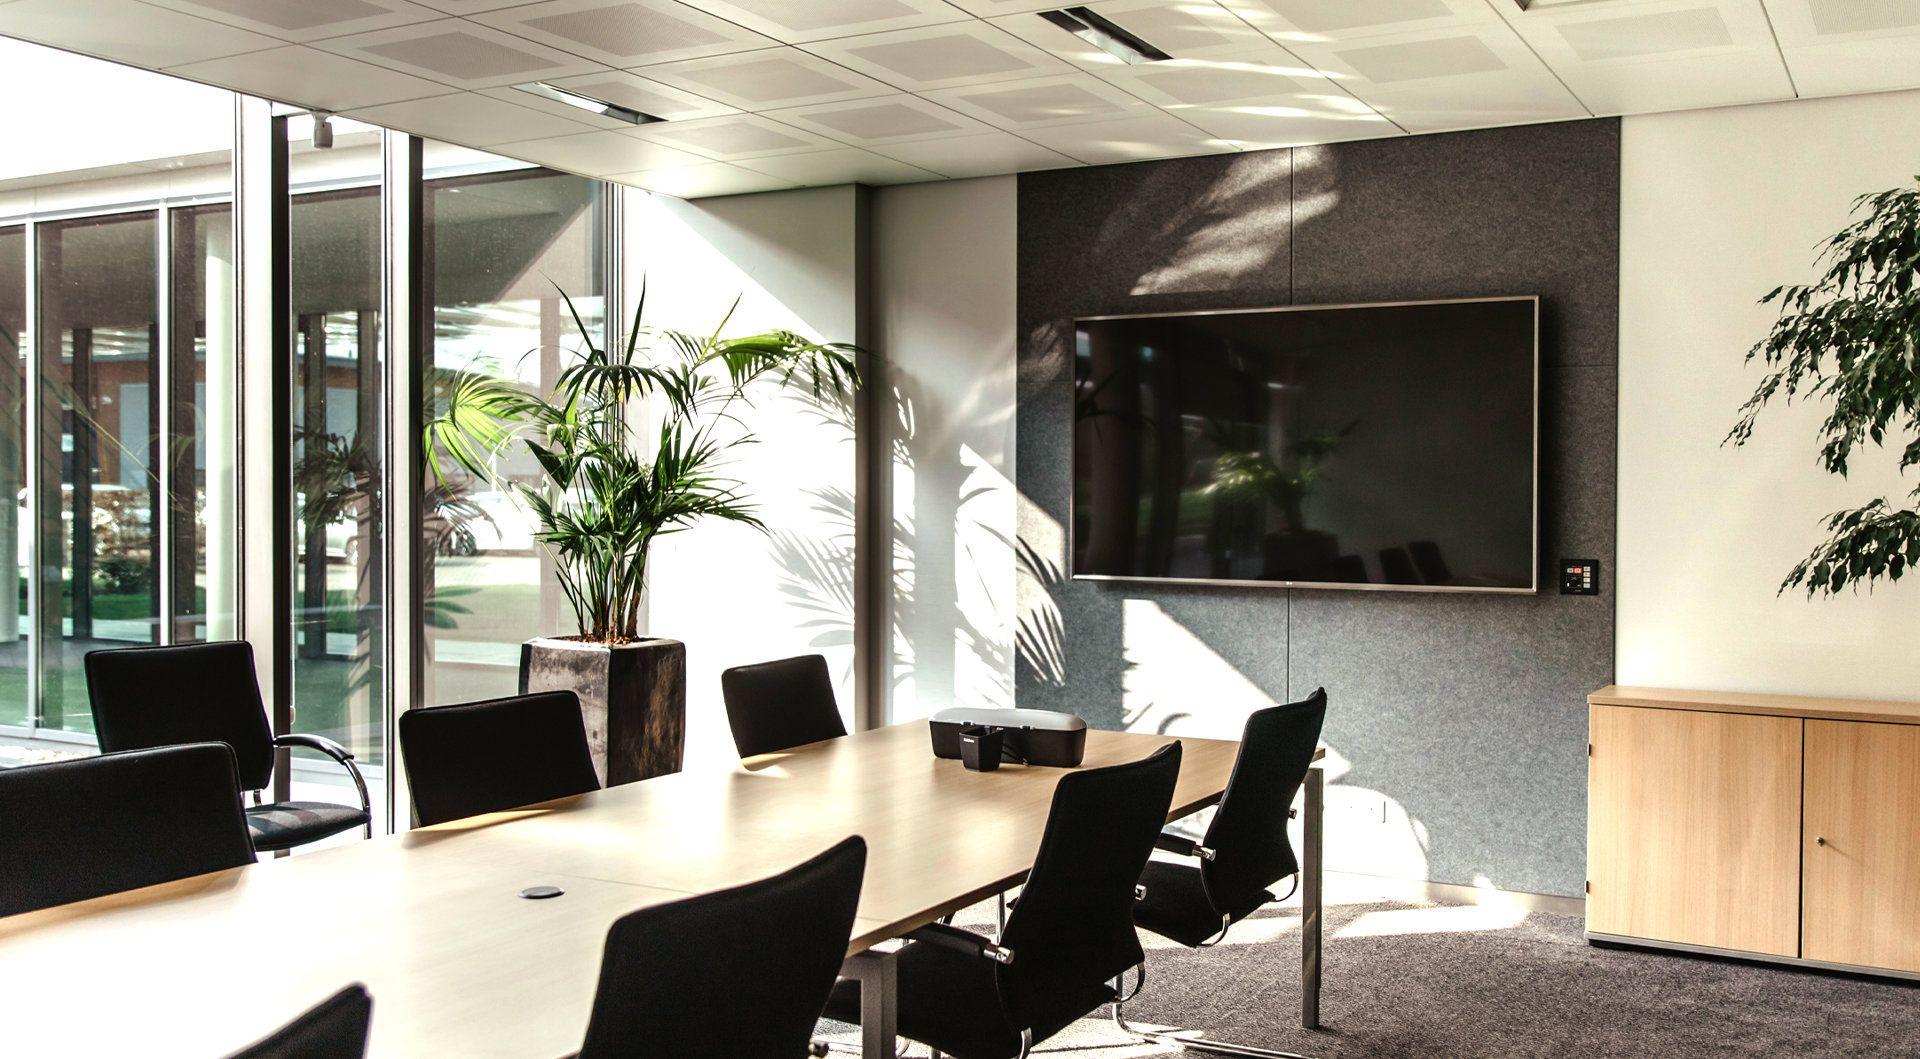 Sony VPL-PHZ50 beamer/projector Plafondgemonteerde projector 5000 ANSI lumens 3LCD 1080p (1920x1080) Zwart, Wit - Case studie de vries